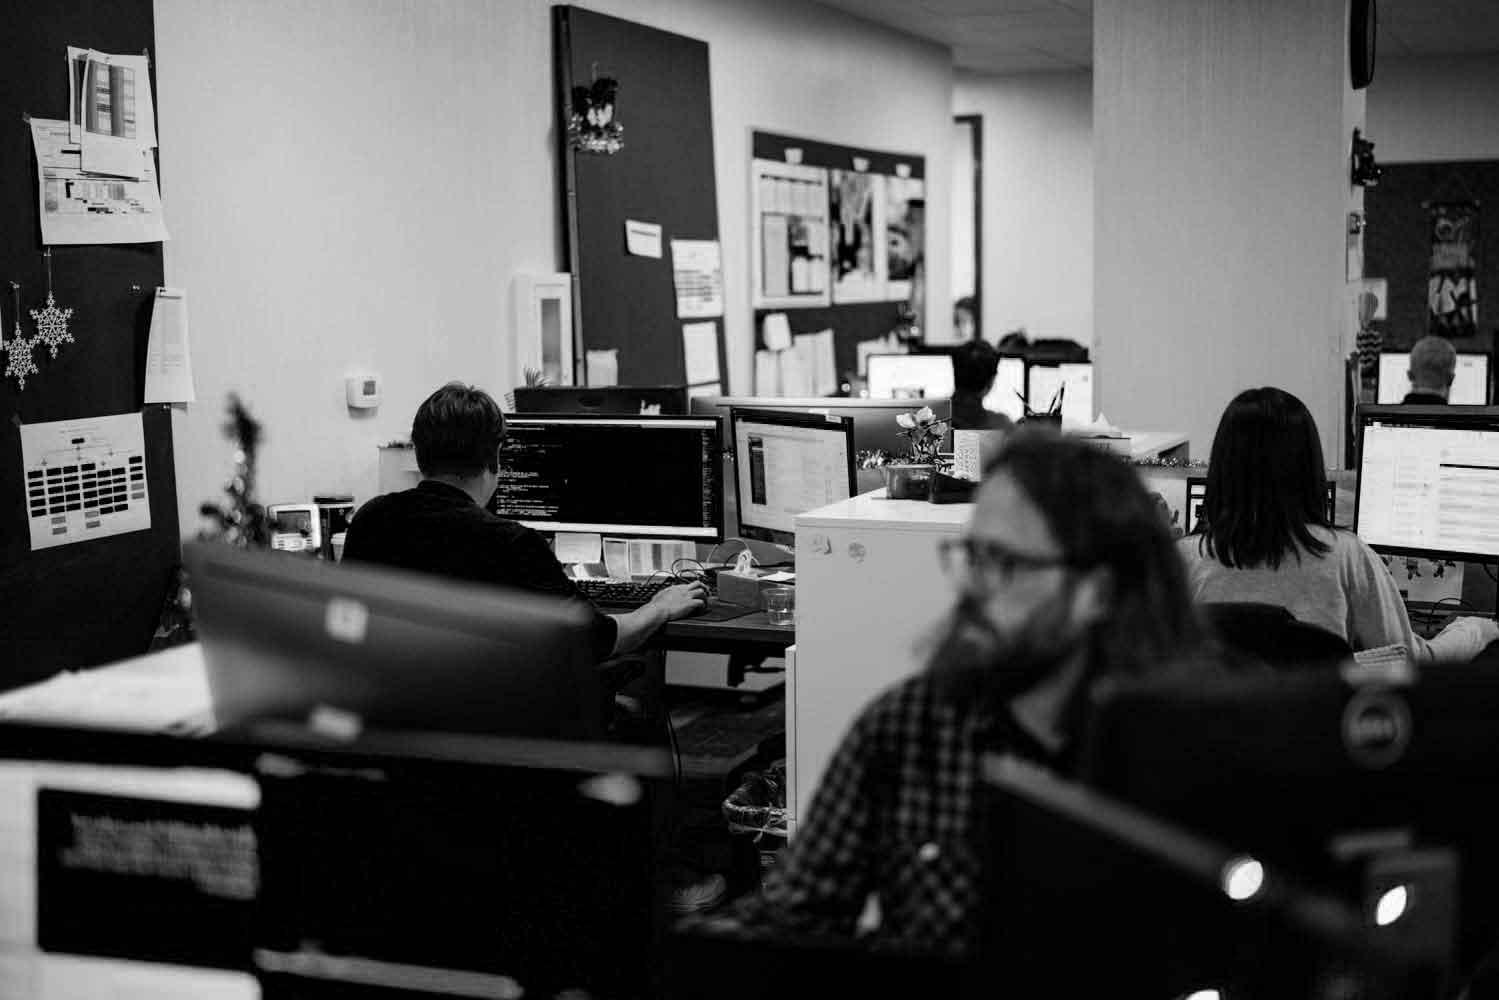 MGM Digital Ventures Office Photo